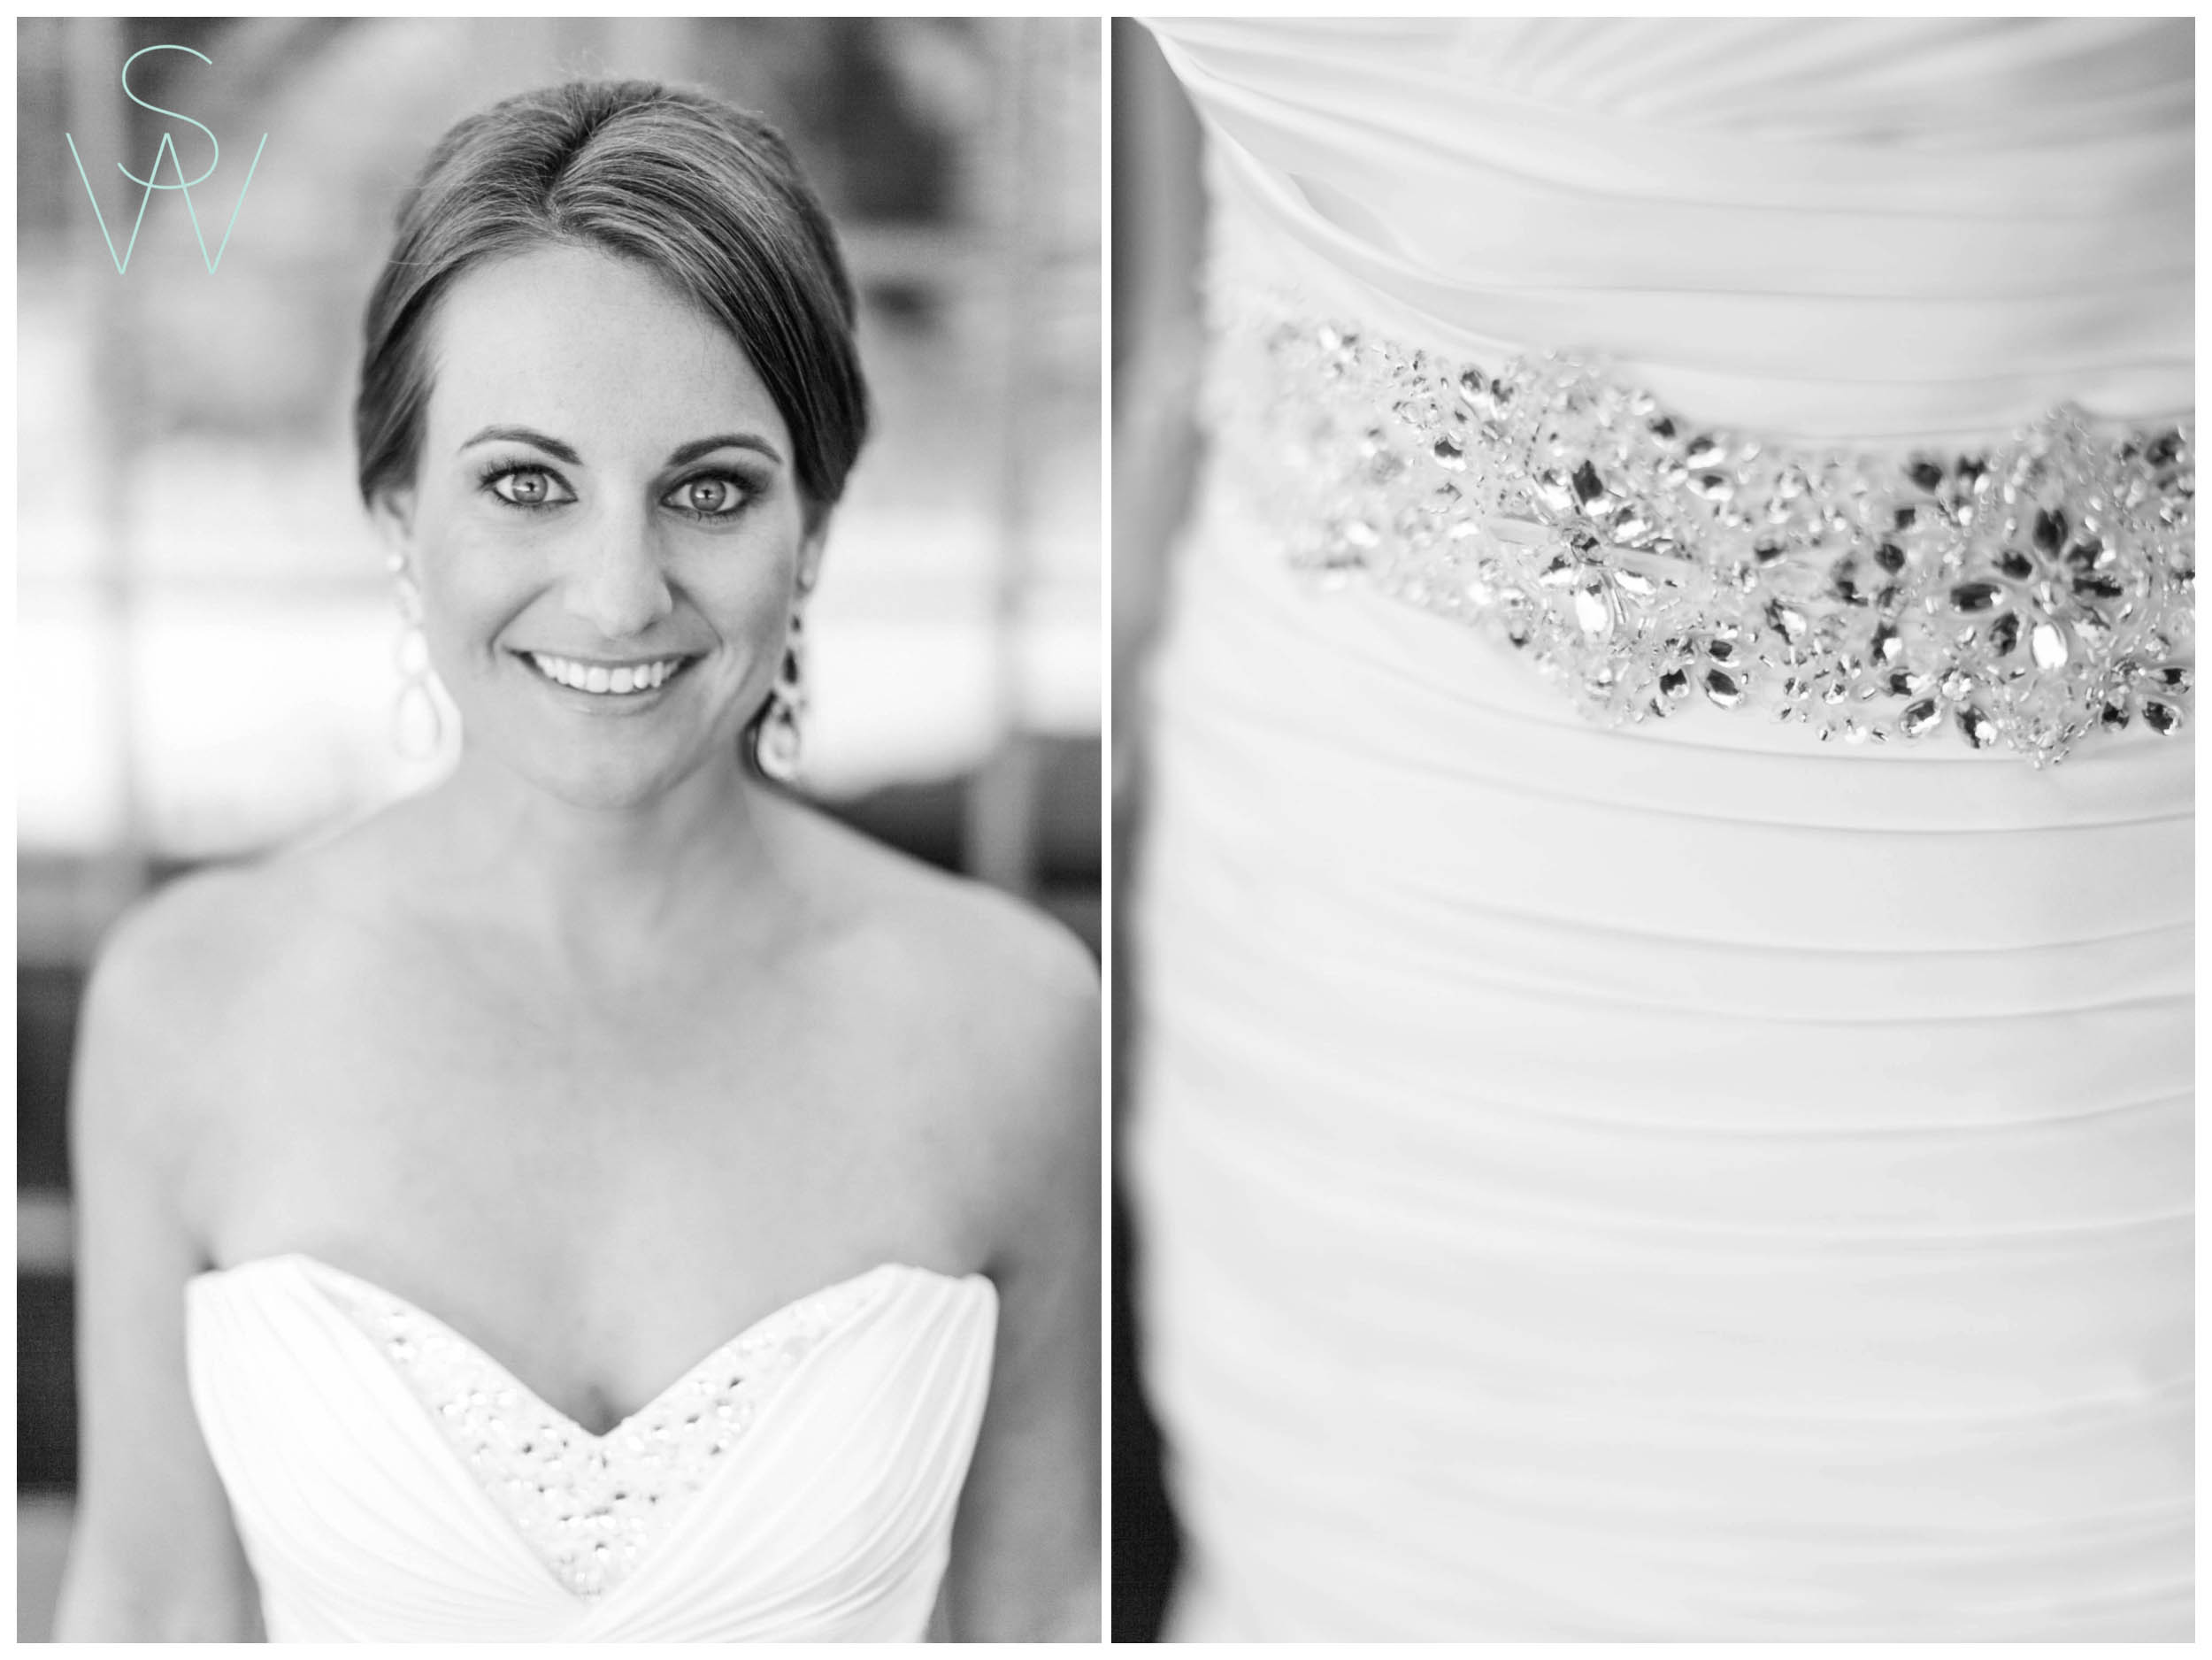 Shewanders.sdma_.wedding.photography-1002.jpg.wedding.photography-1002.jpg